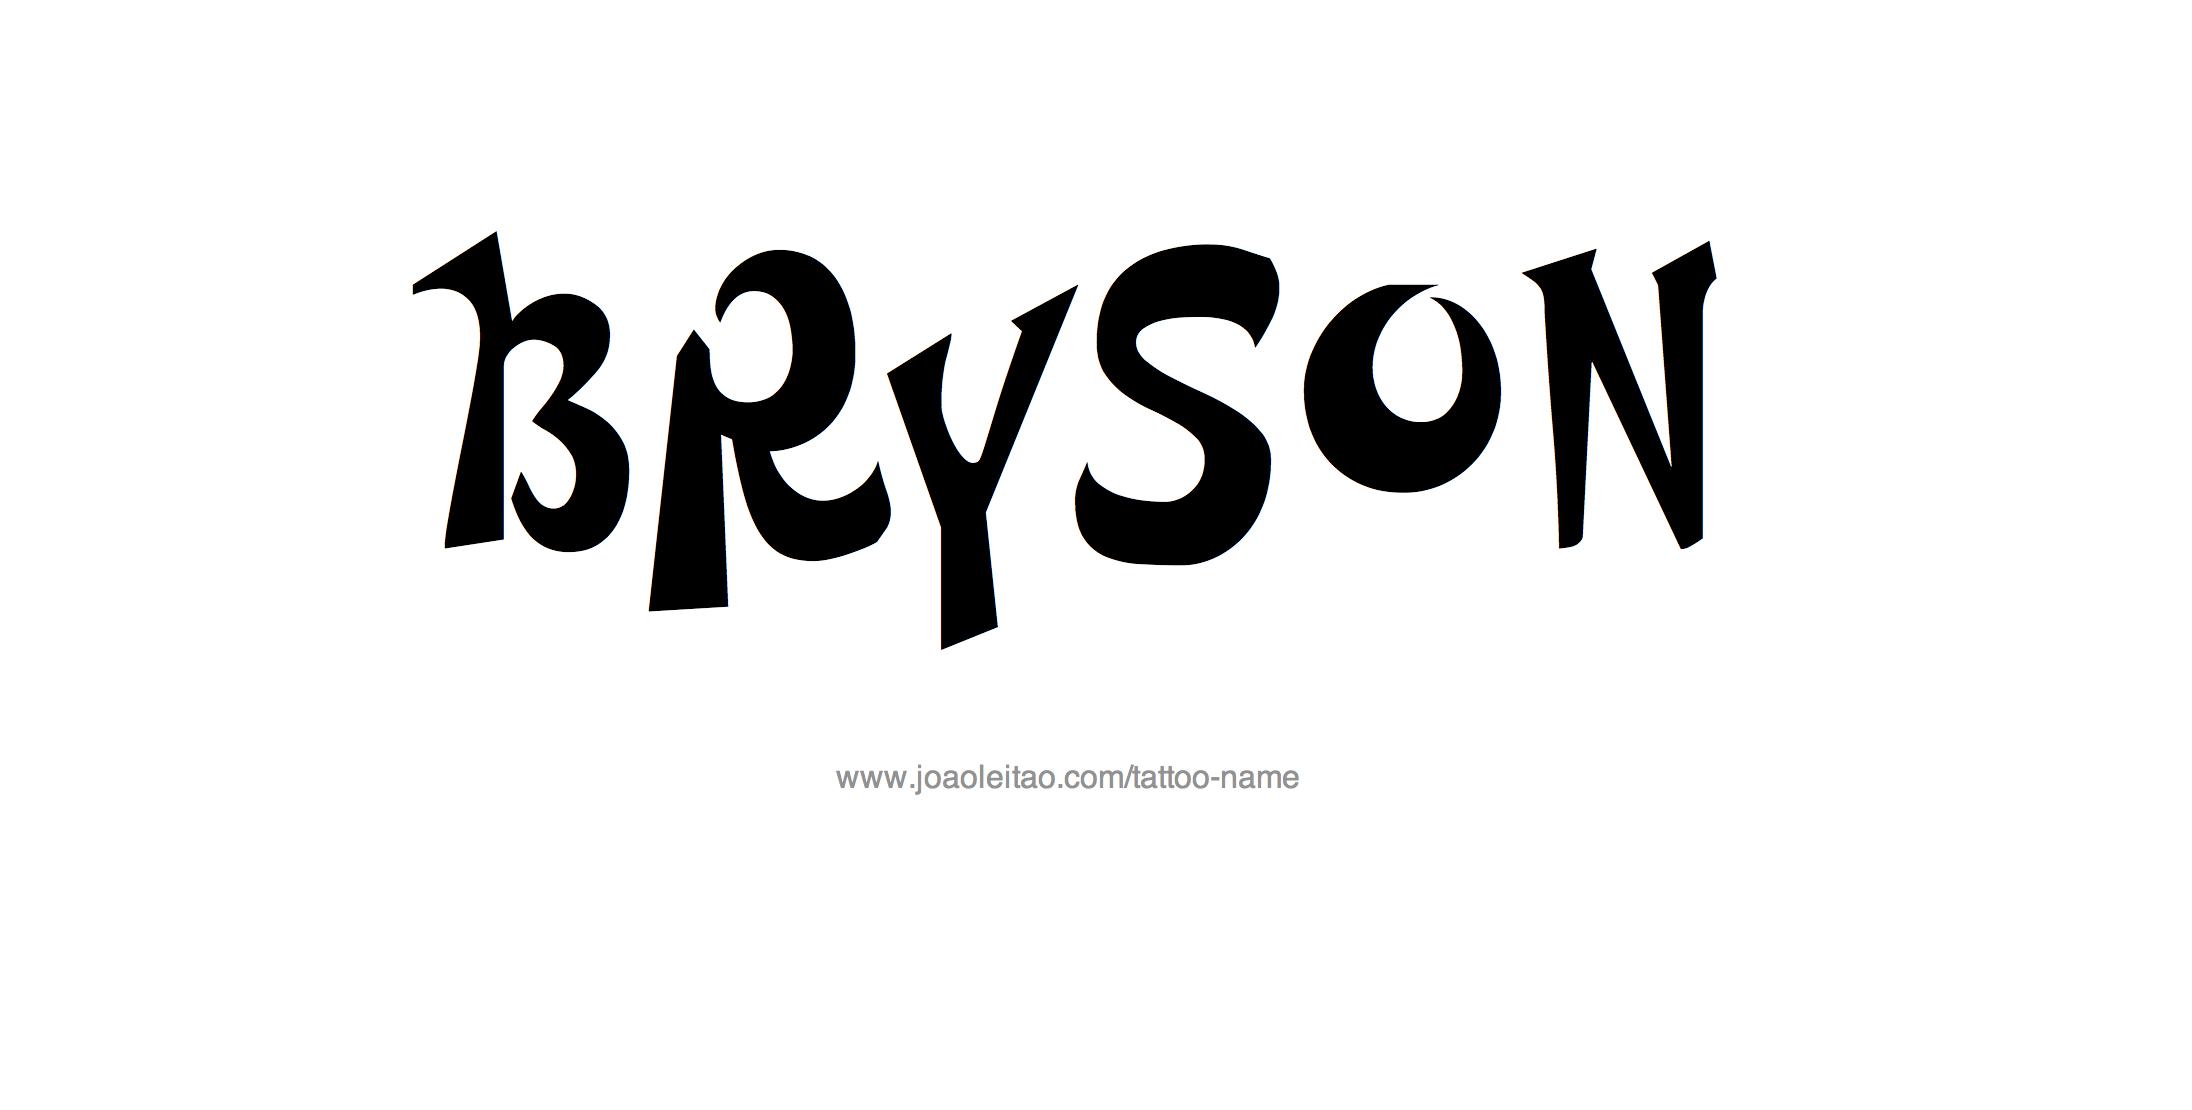 Tattoo Design Name Bryson